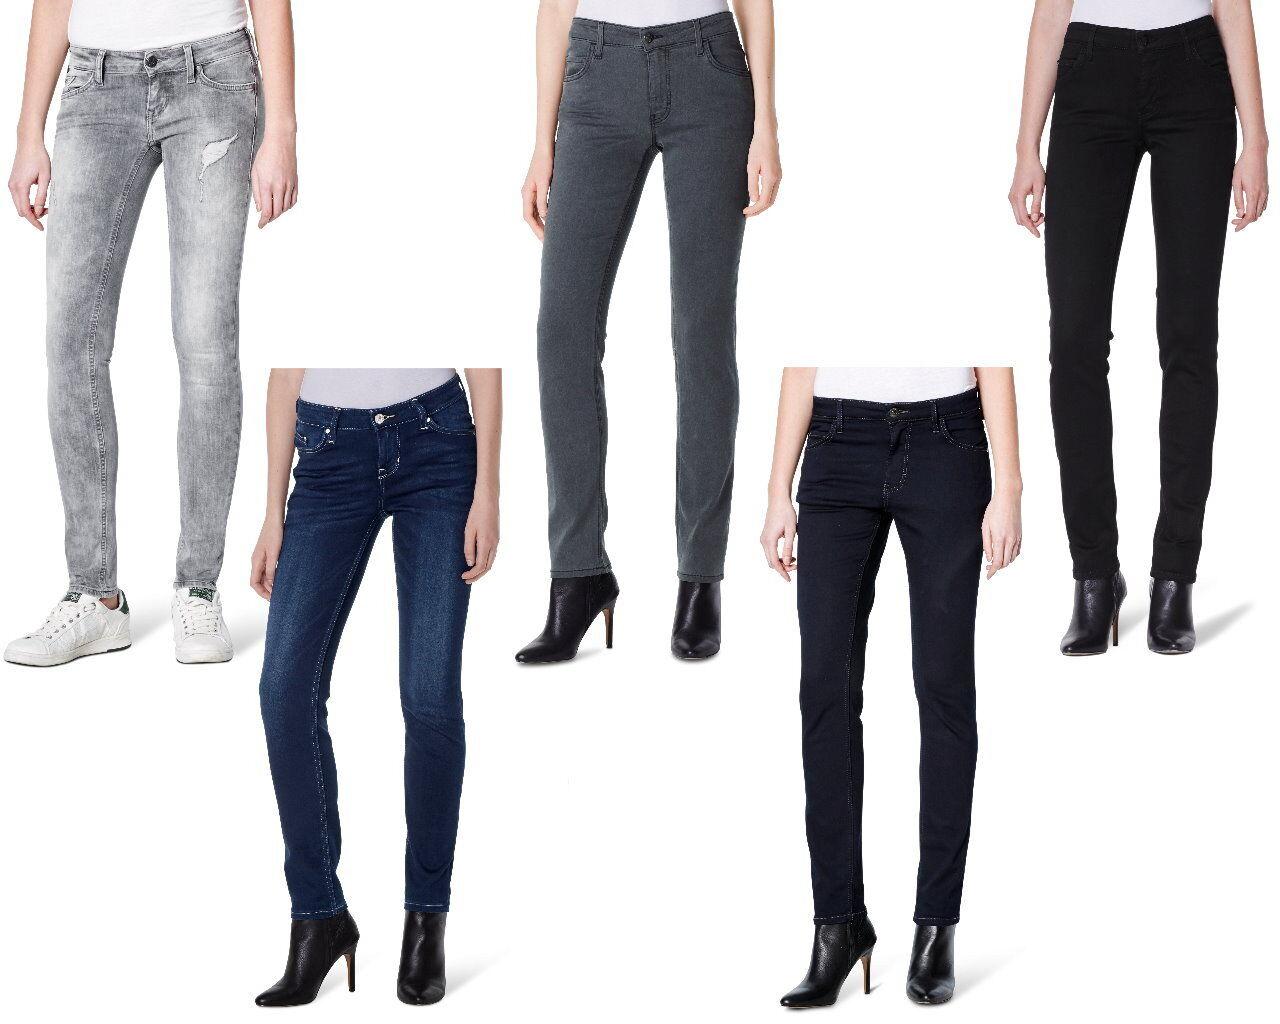 Mustang Gina,Jasmin,Jeggins   Sissy Slim Jeans ,W25 -a- W38 Nuovo - Fantastico